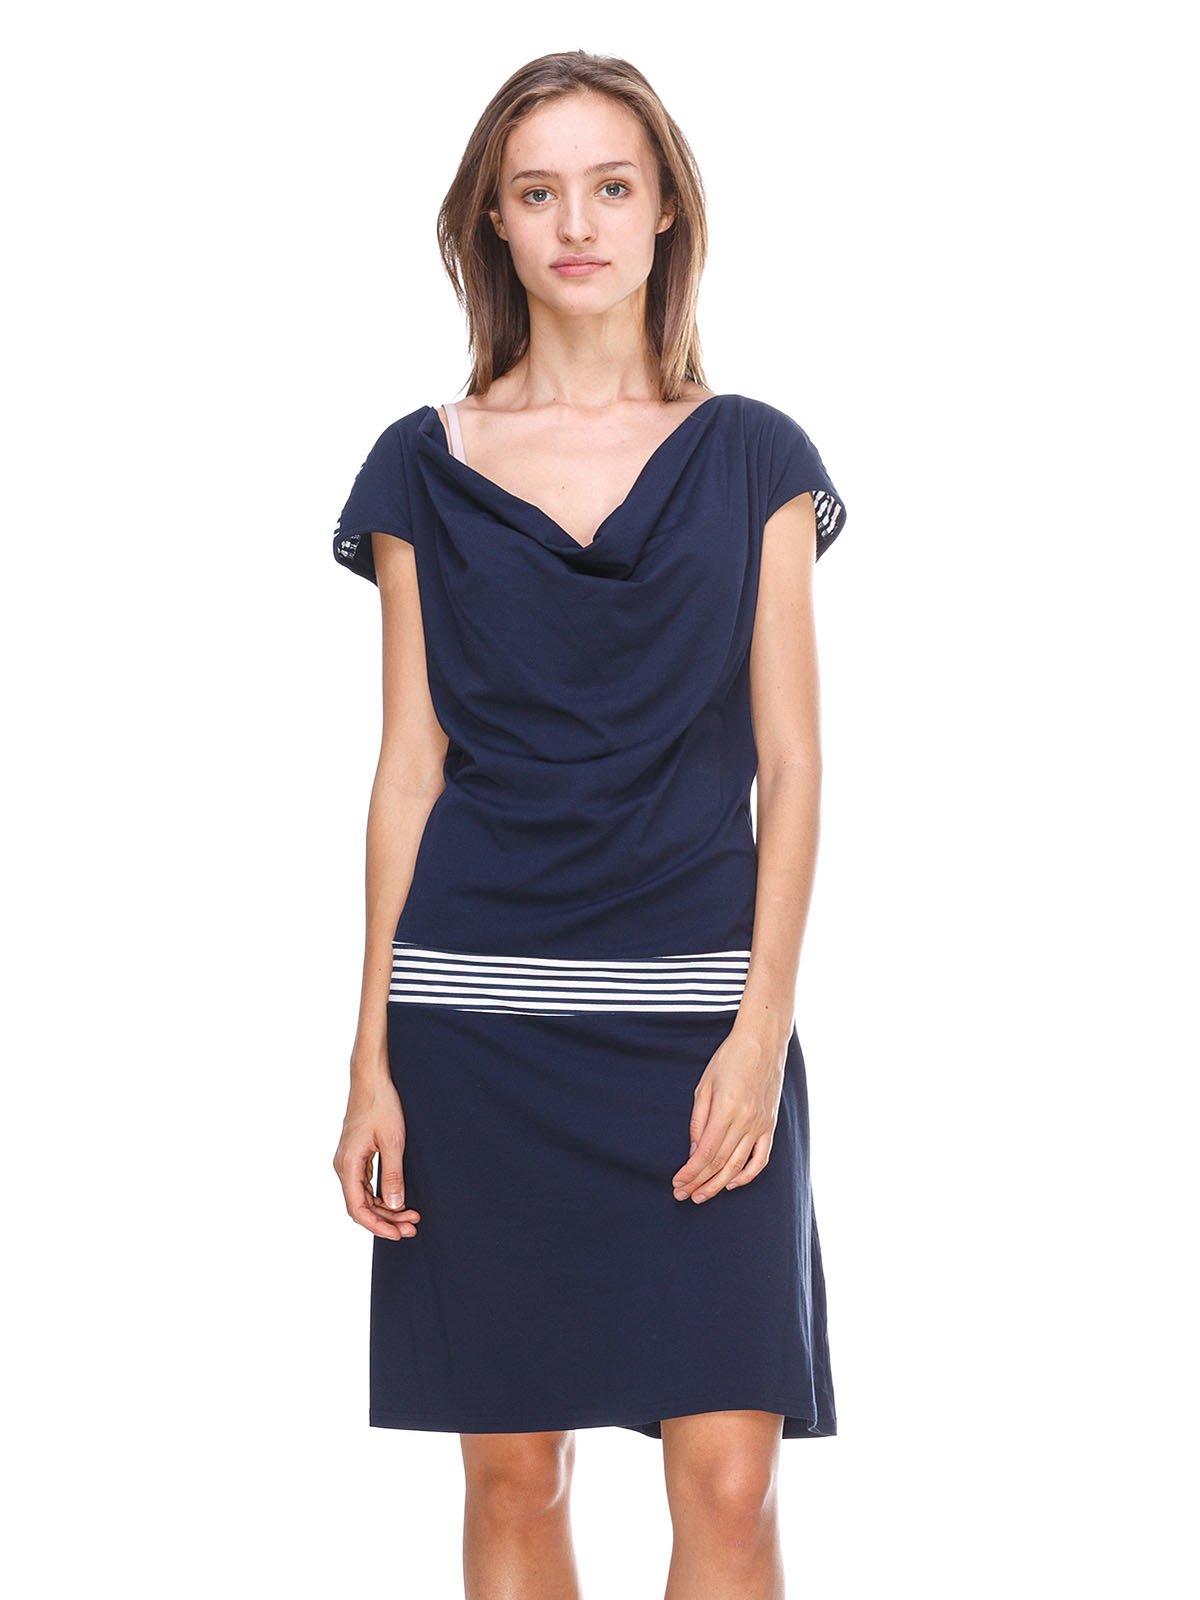 Сукня темно-синя з смужками | 2619379